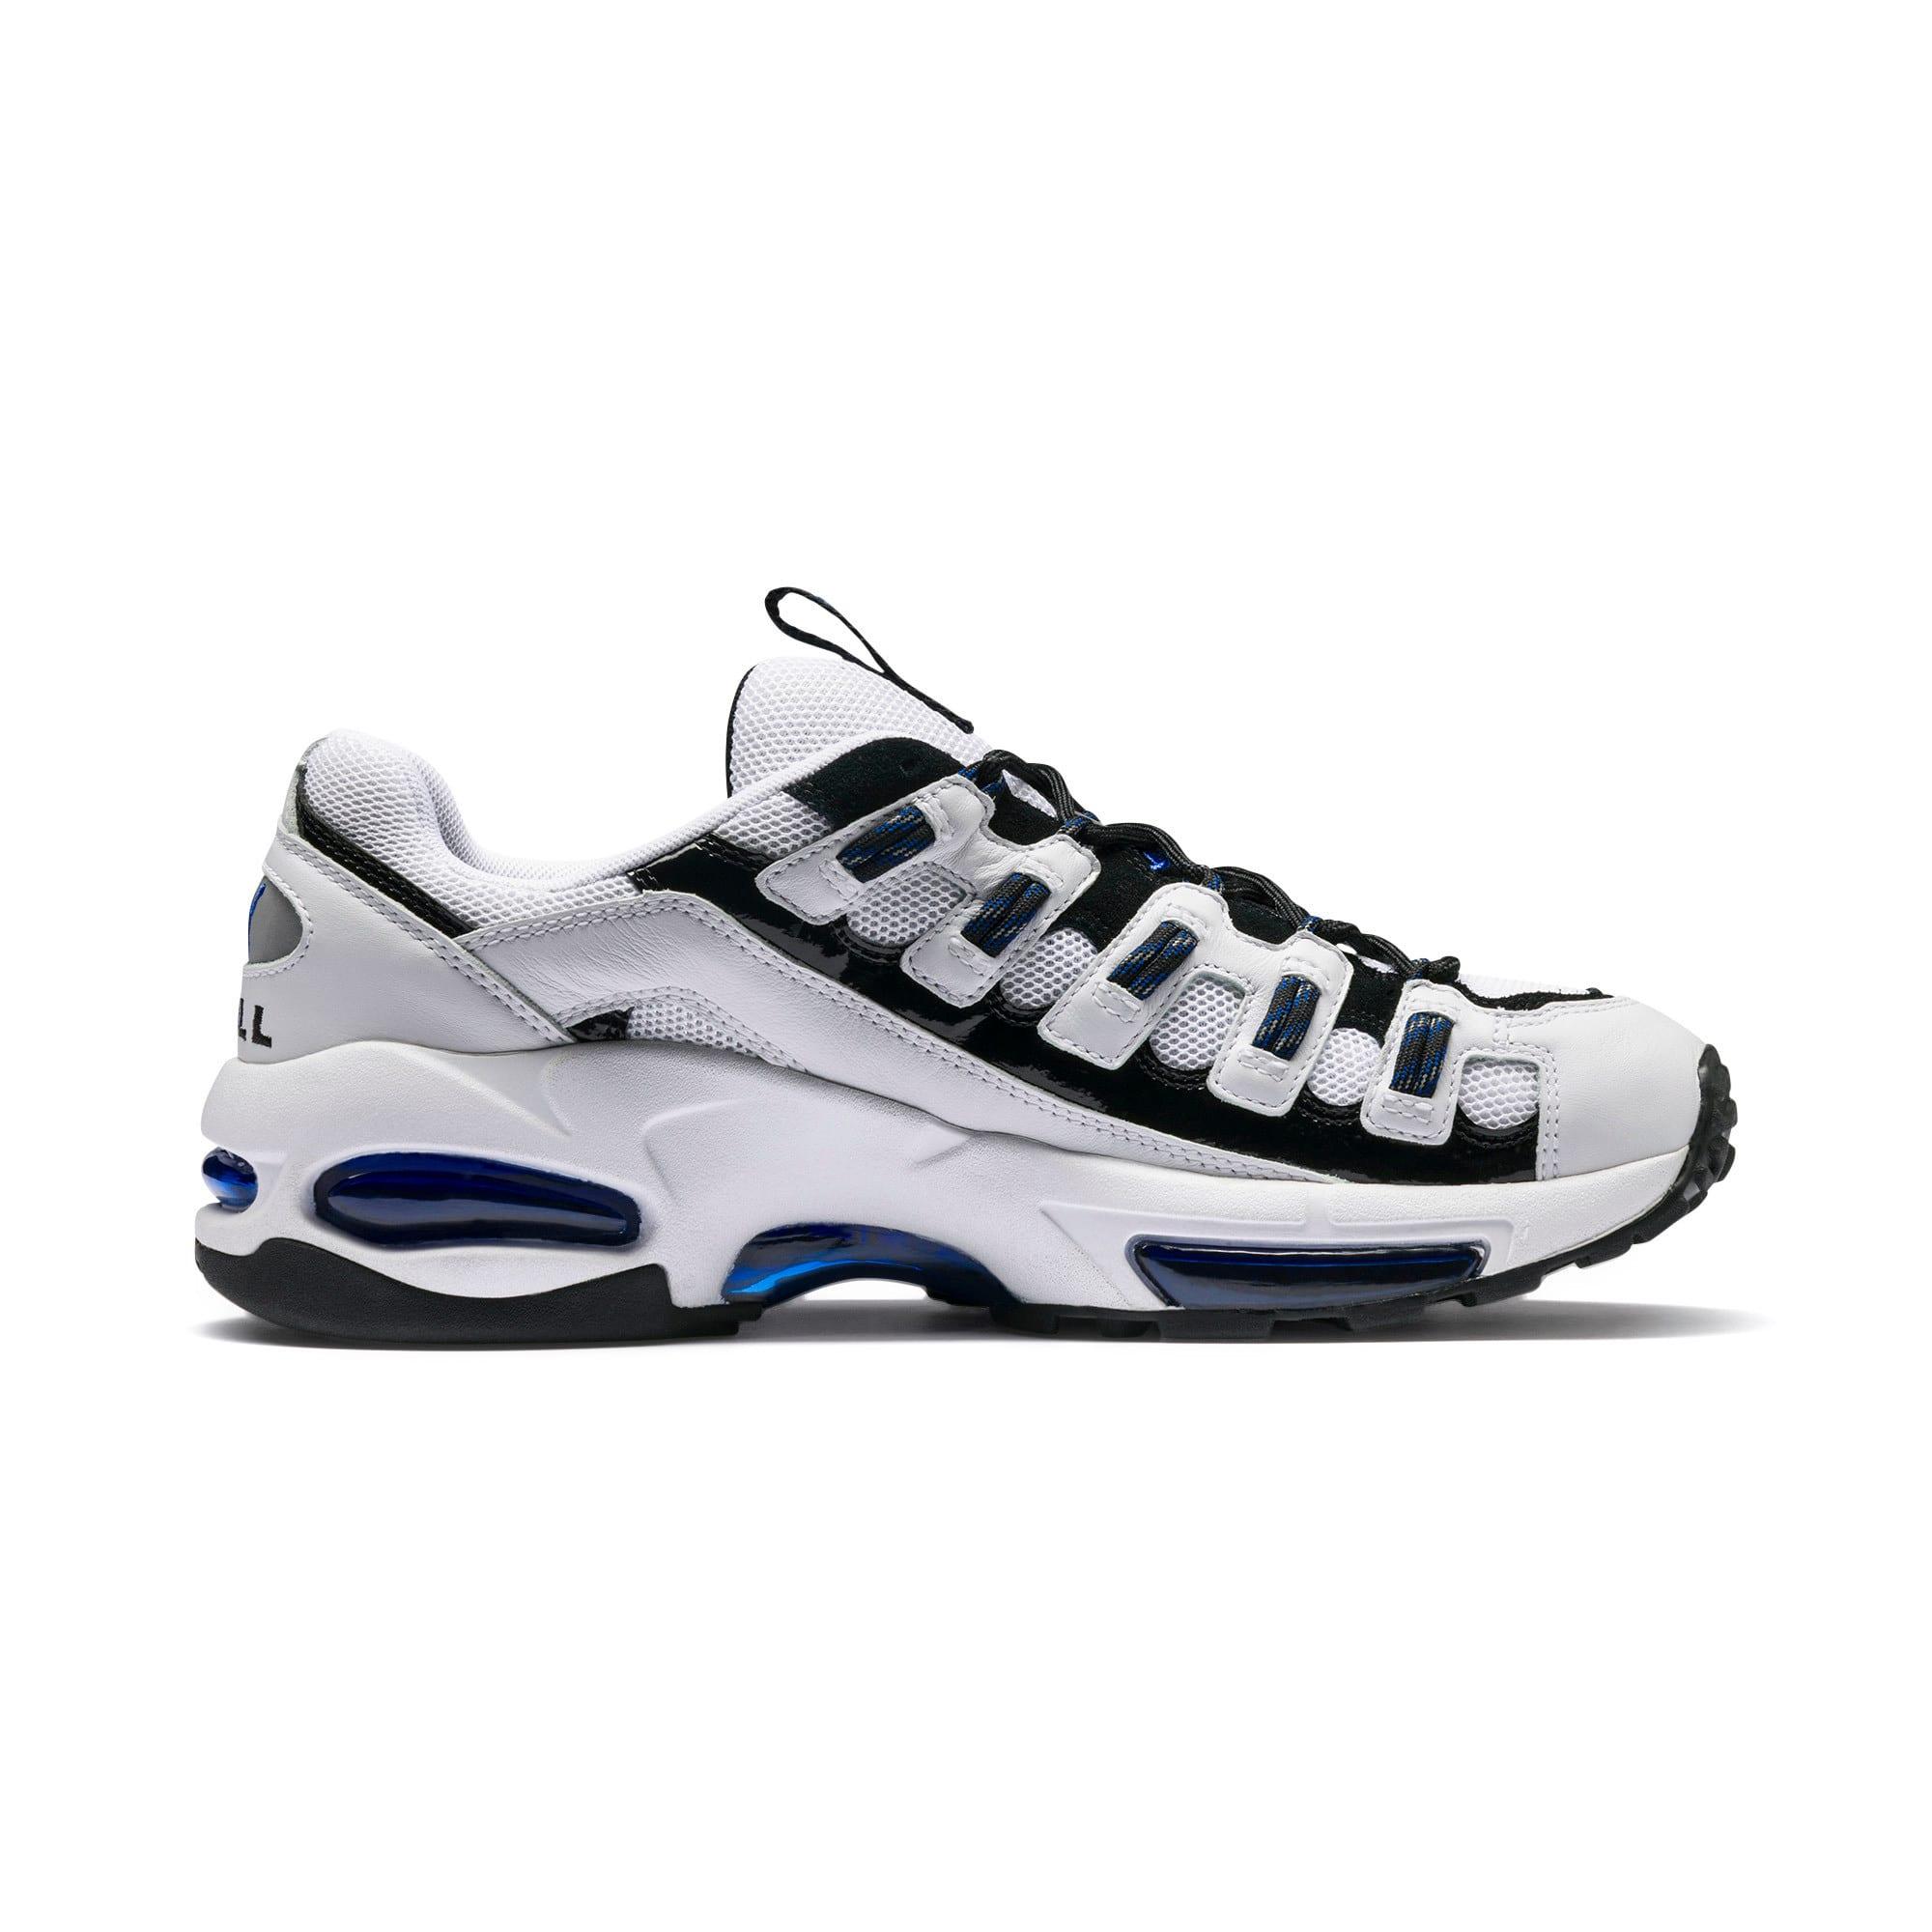 Thumbnail 6 of CELL Endura Patent 98 Men's Sneakers, Puma White-Surf The Web, medium